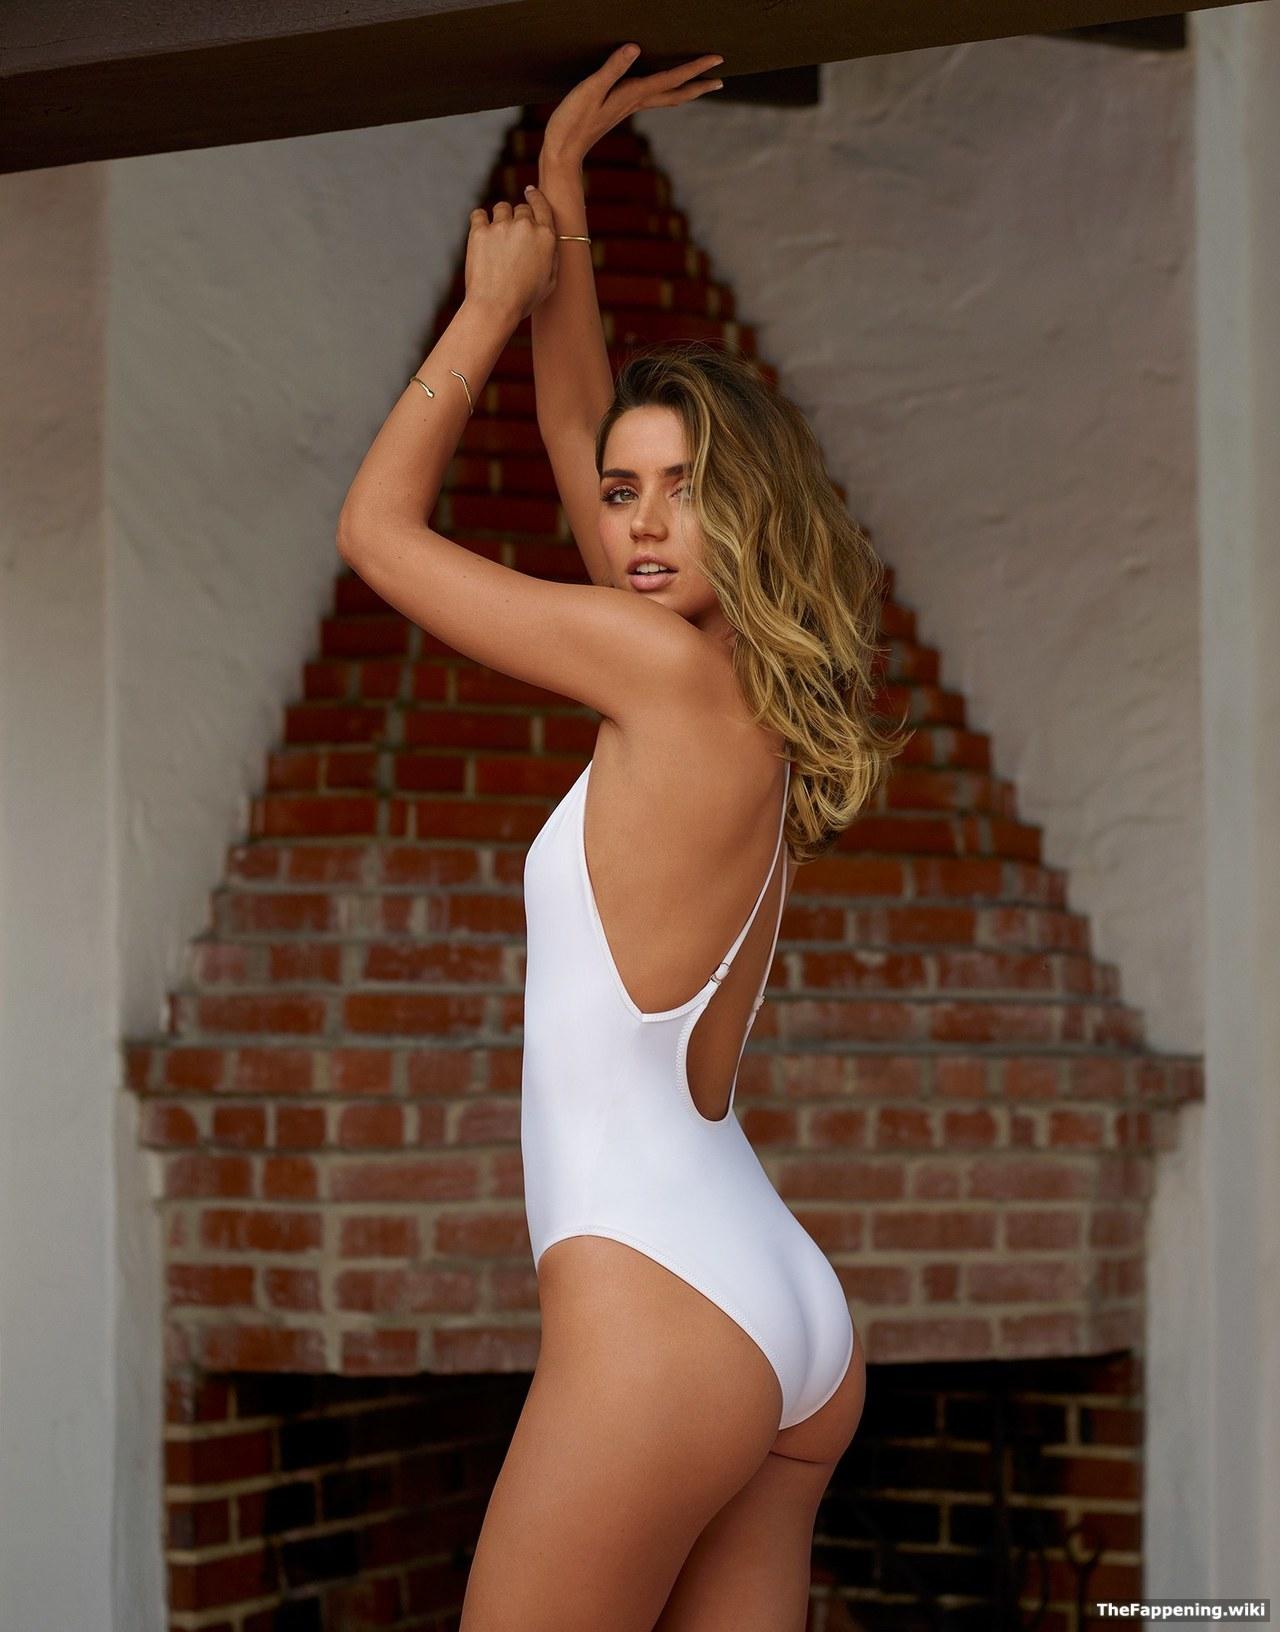 Ana De Armas Boobs ana de armas nude pics & vids - the fappening